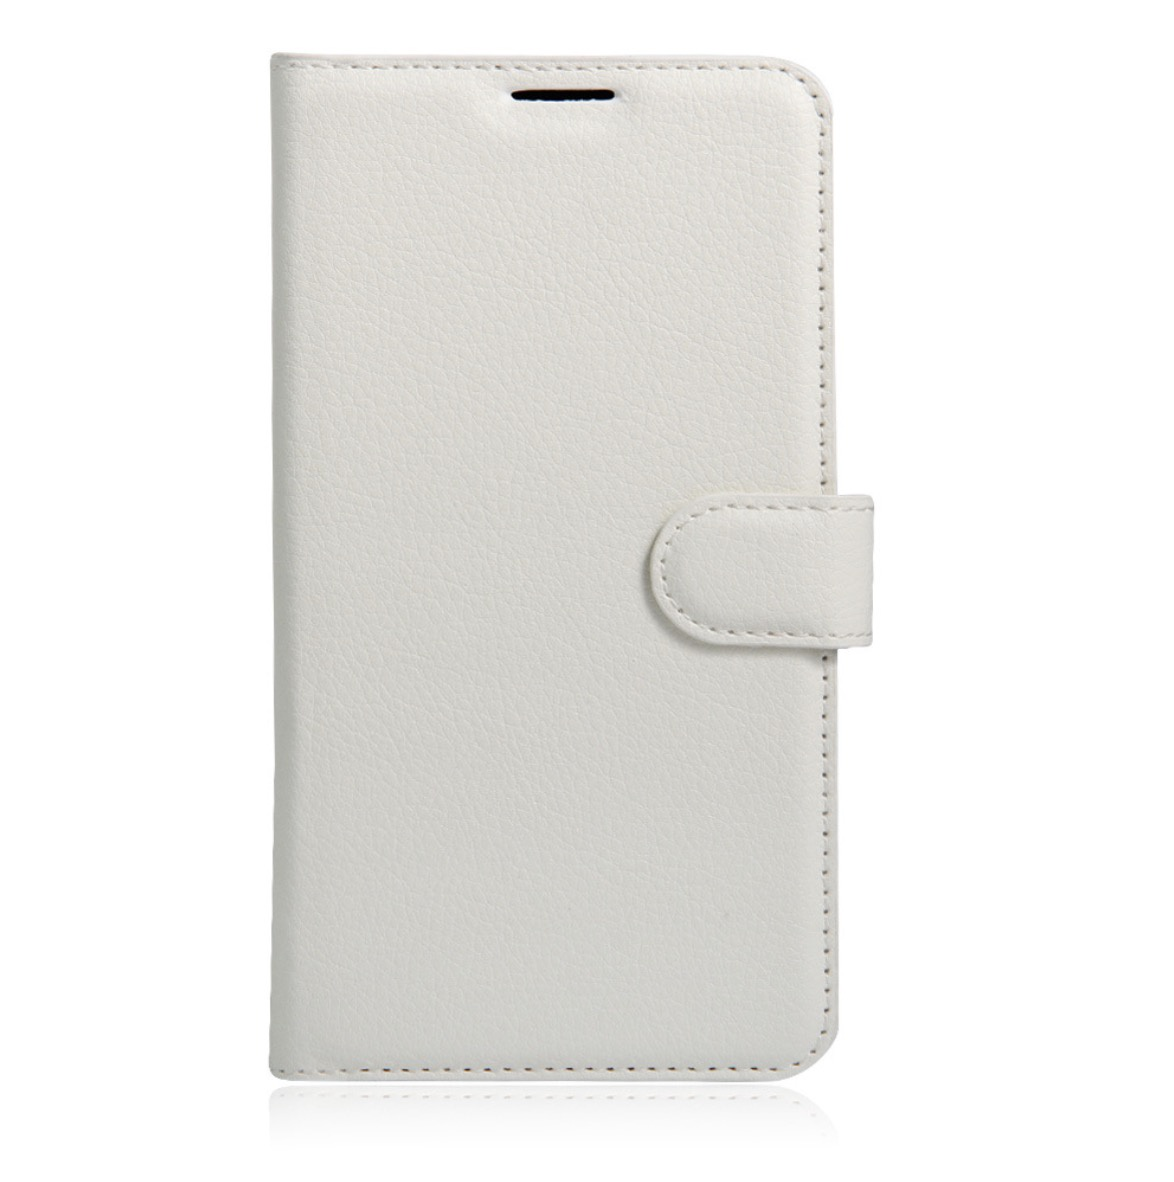 цена на Чехол-книжка MyPads для Lenovo Vibe K5/ Vibe K5 Plus (A6020 / A6020a40 / A6020a46) 5.0 с мульти-подставкой застёжкой и визитницей белый